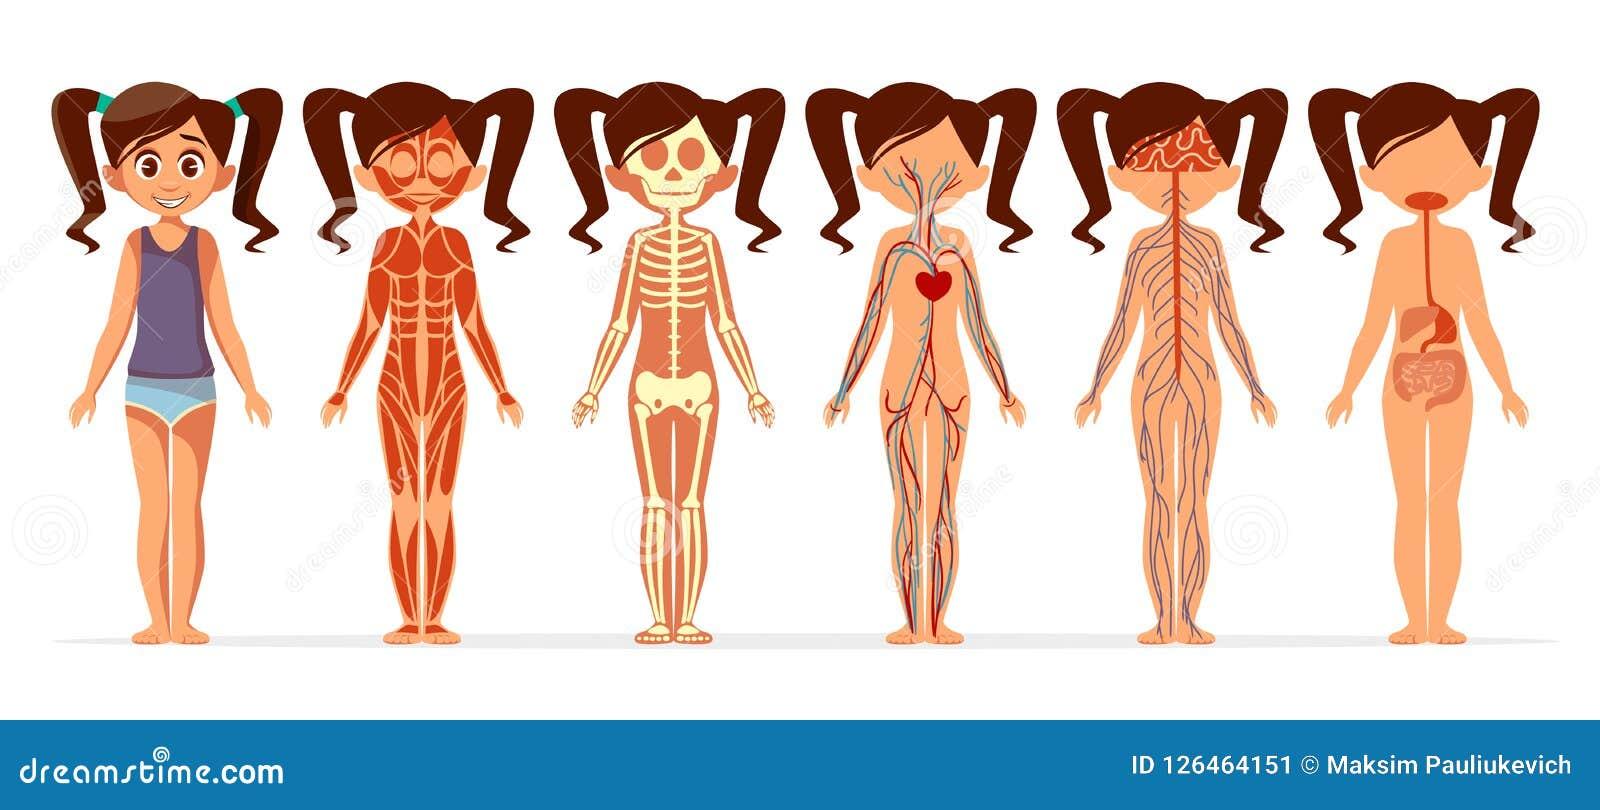 Girl Body Anatomy Cartoon Illustration Of Female Muscular Skeletal Circulatory Or Nervous And Digestive System Stock Illustration Illustration Of Biology Heart 126464151